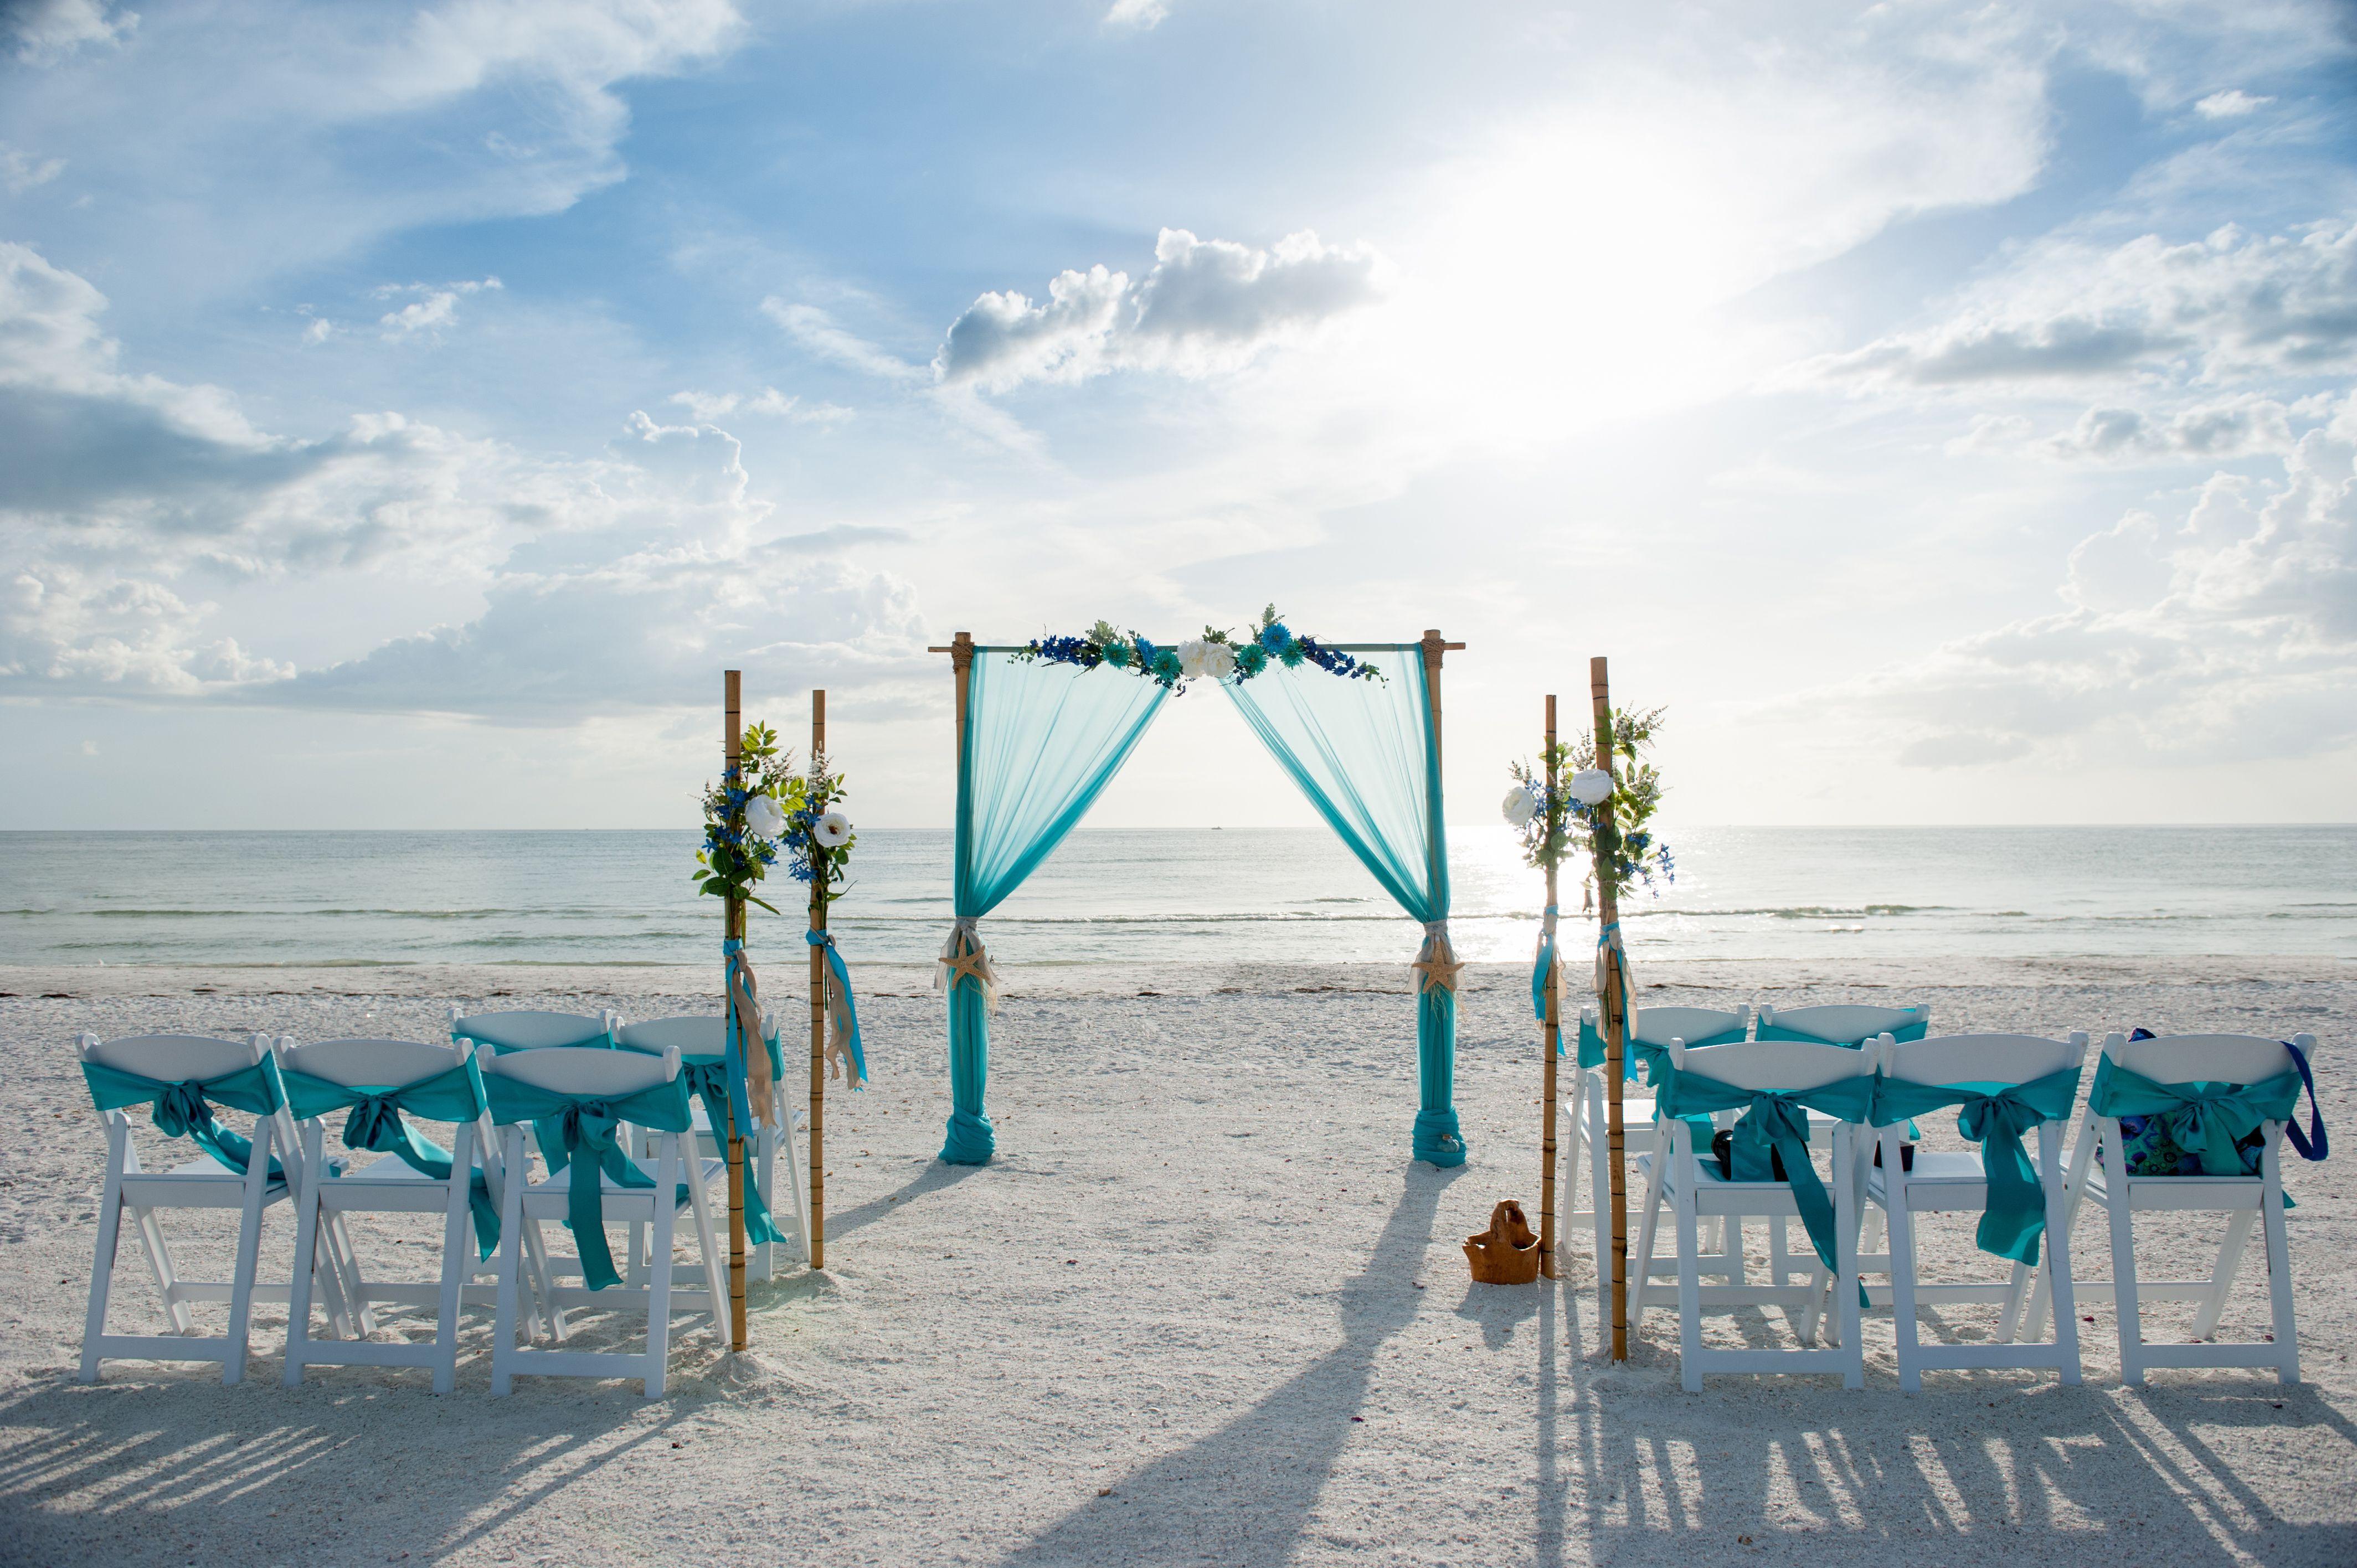 Teal Beach Wedding Arch Teal Beach Wedding Florida Beach Wedding Beach Wedding Arch